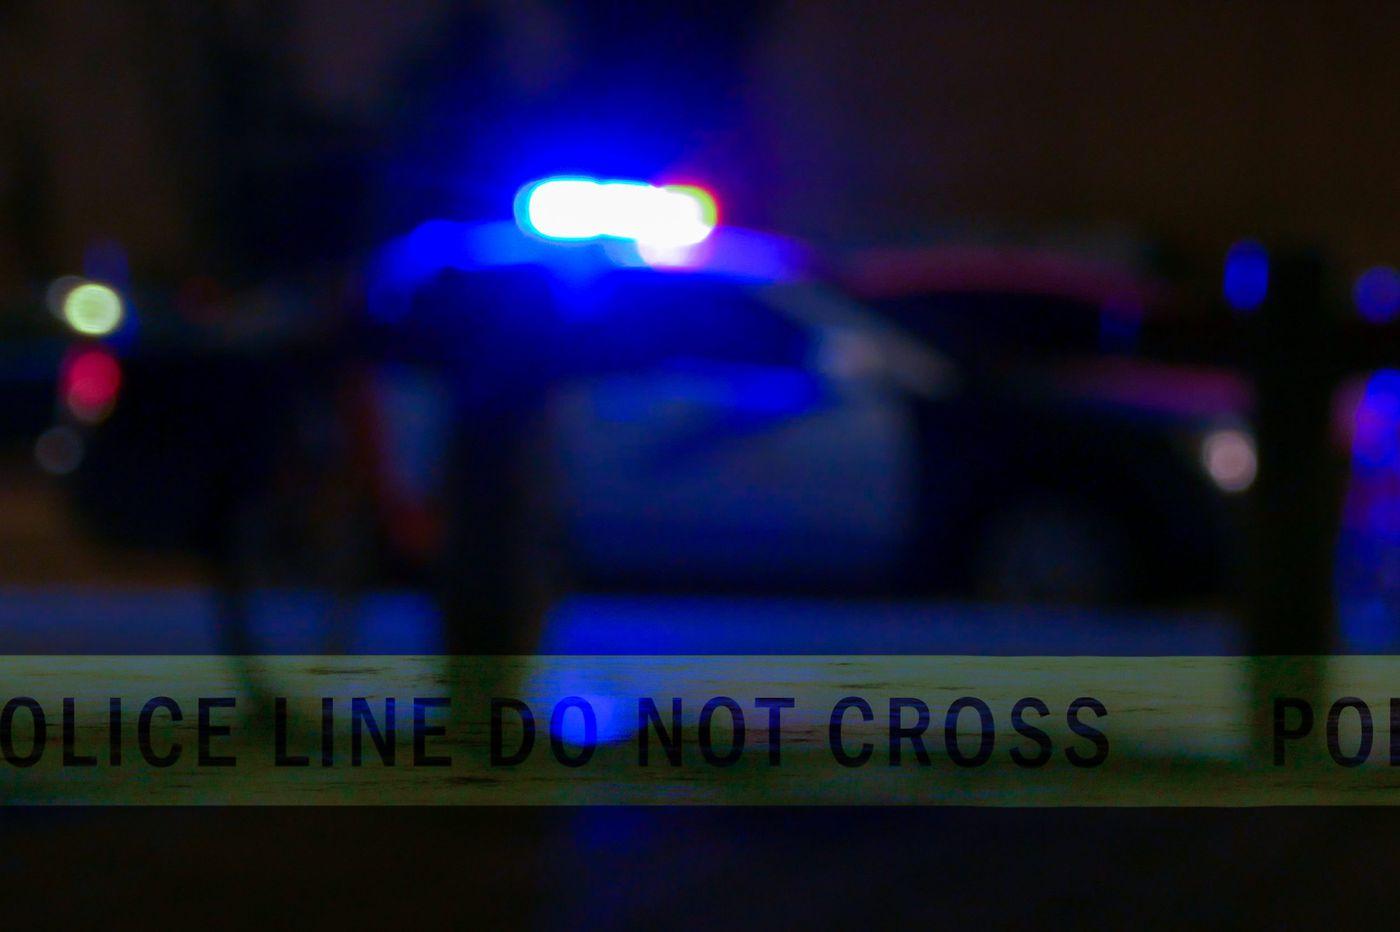 2 Philadelphia men killed in Bucks County campground altercation